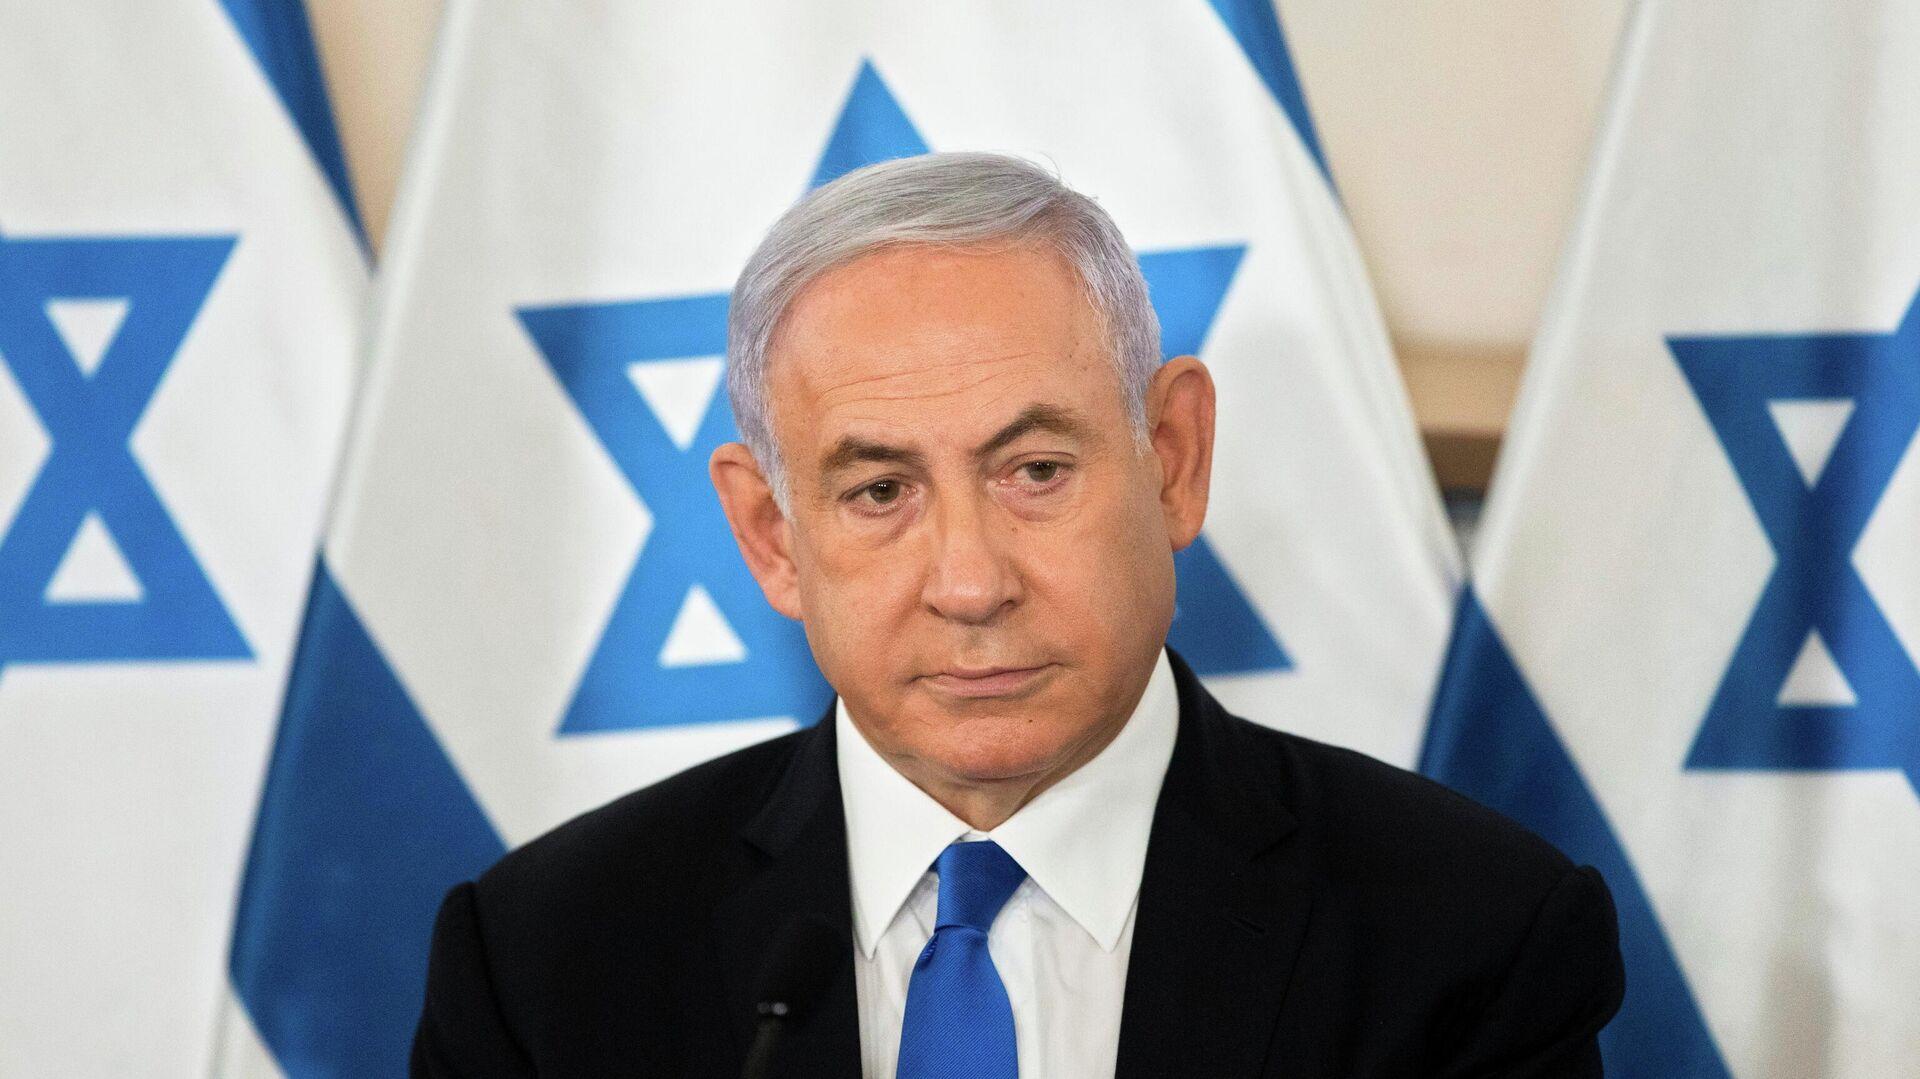 Benjamin Netanyahu, primer ministro israelí - Sputnik Mundo, 1920, 21.05.2021